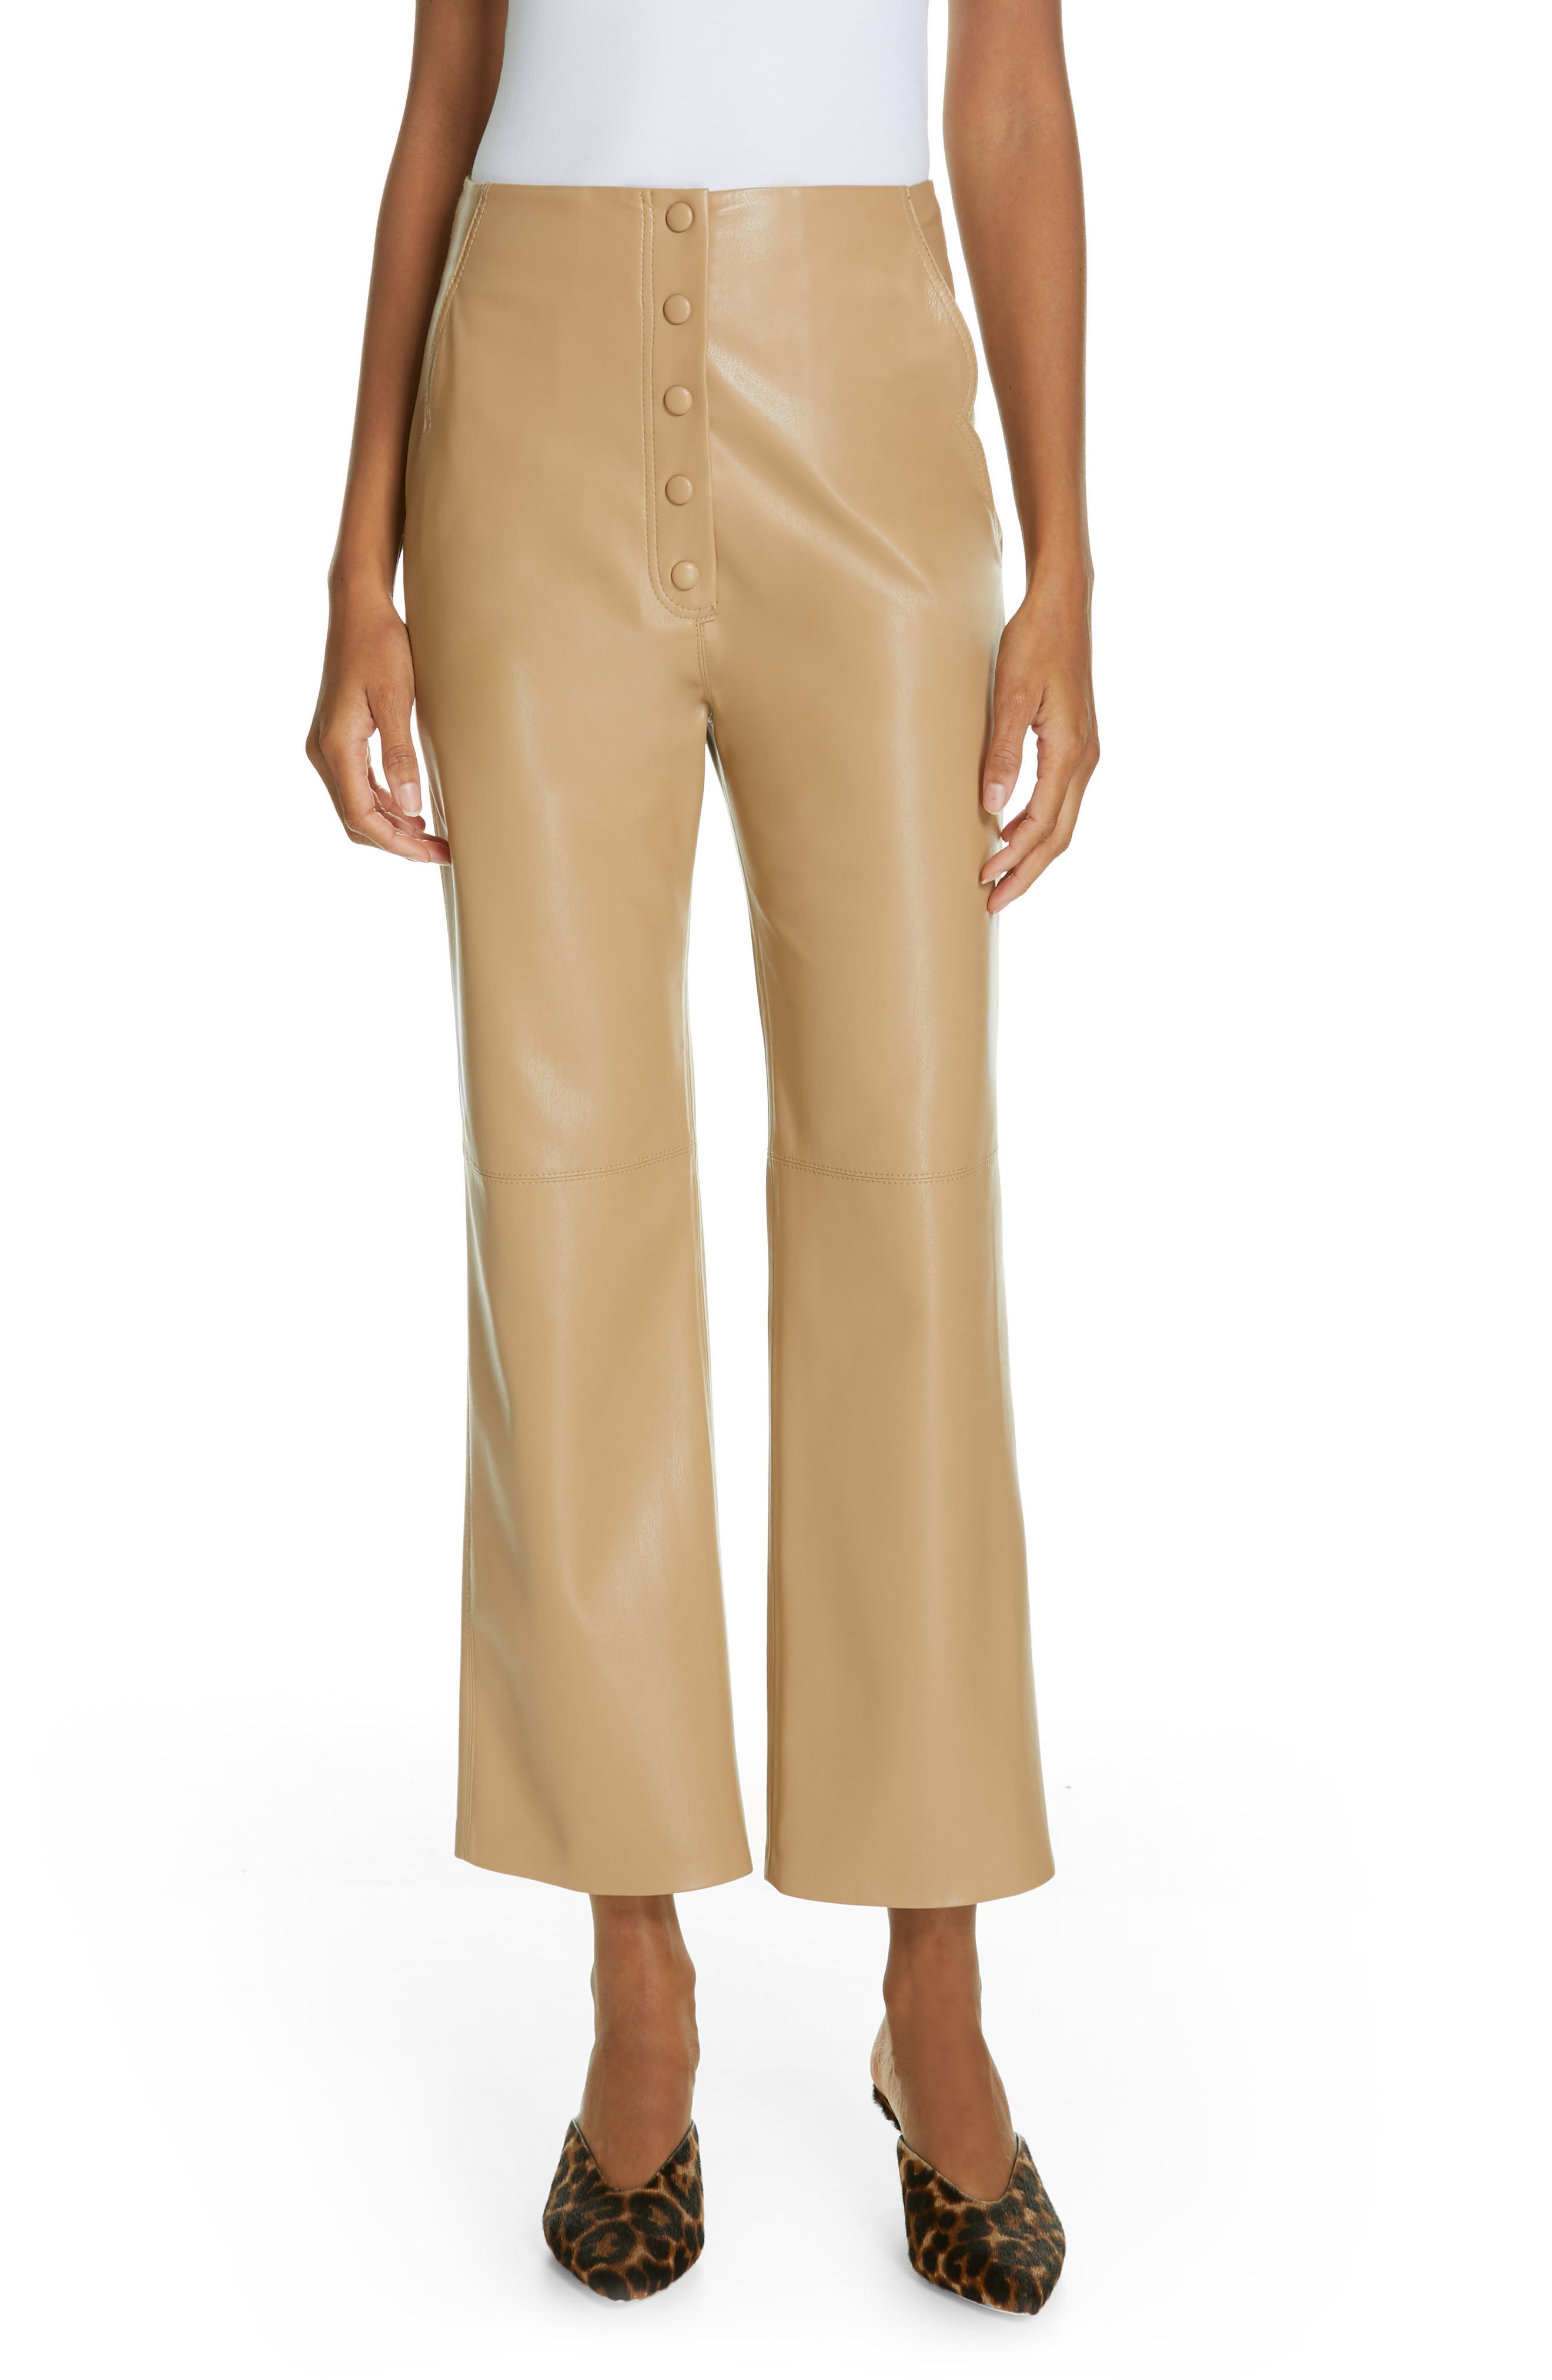 Nanushka Sora Faux Leather Crop Flare Pants, Brown